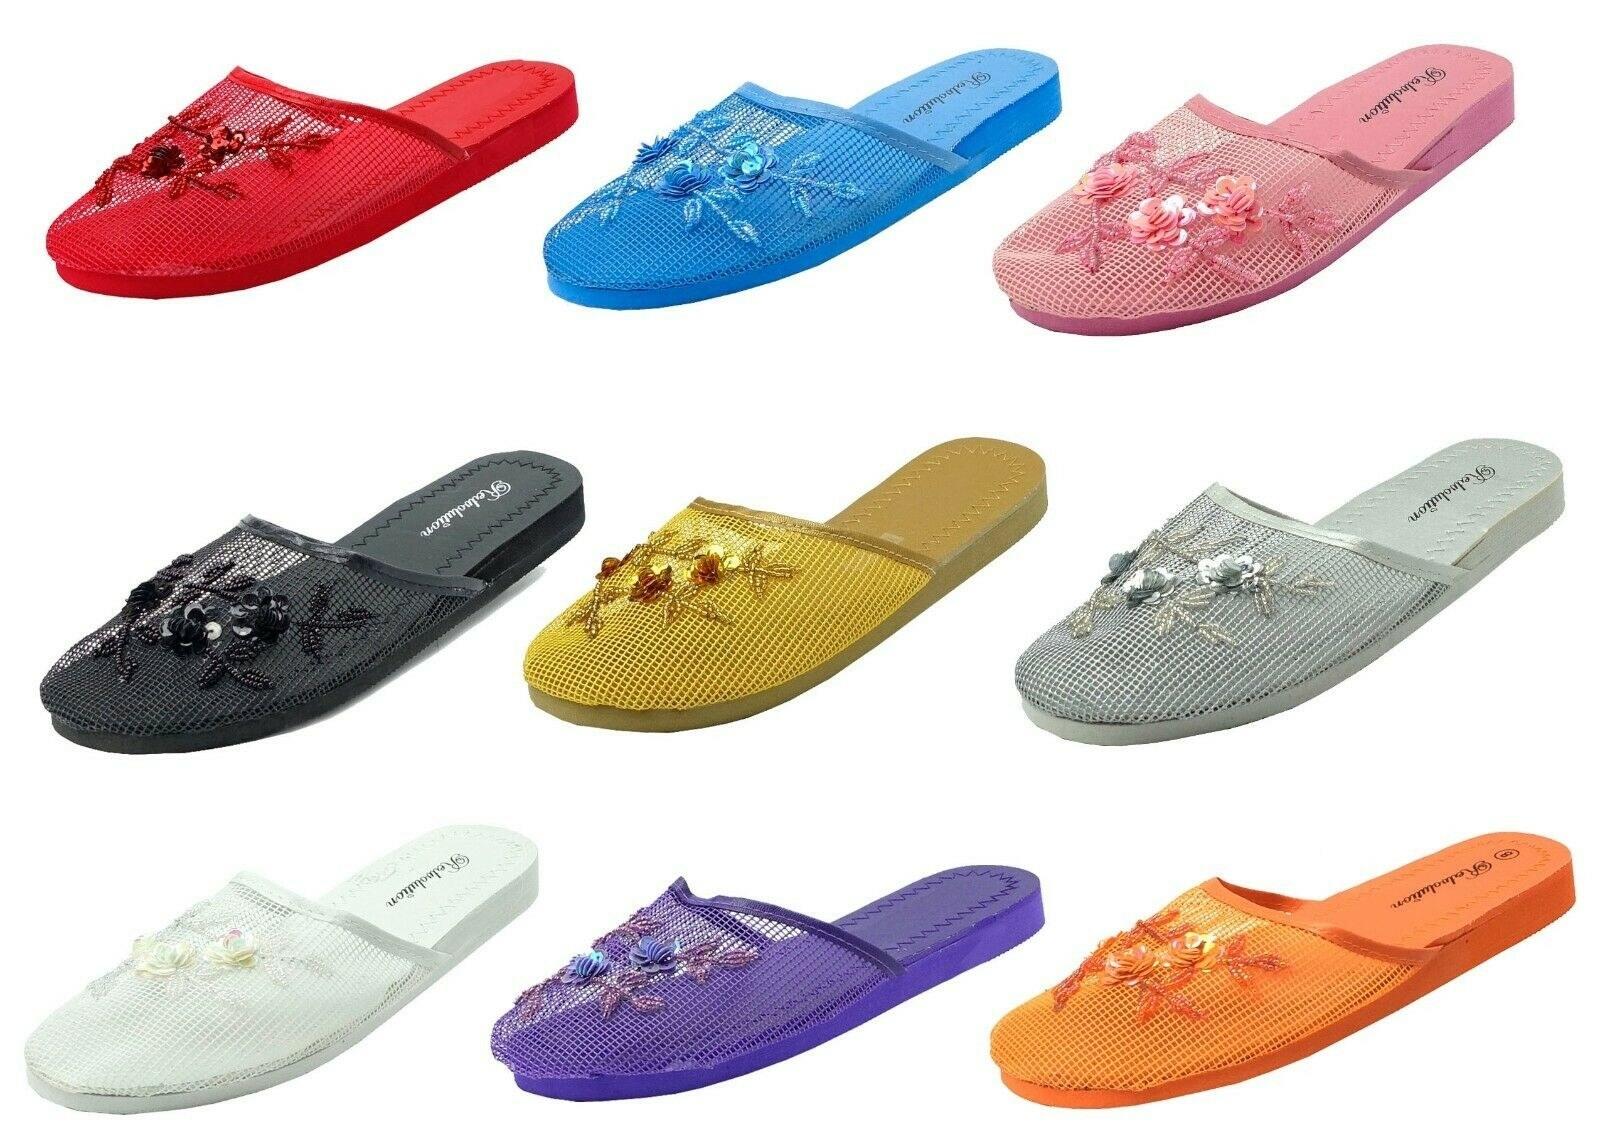 Nine different mesh slippers